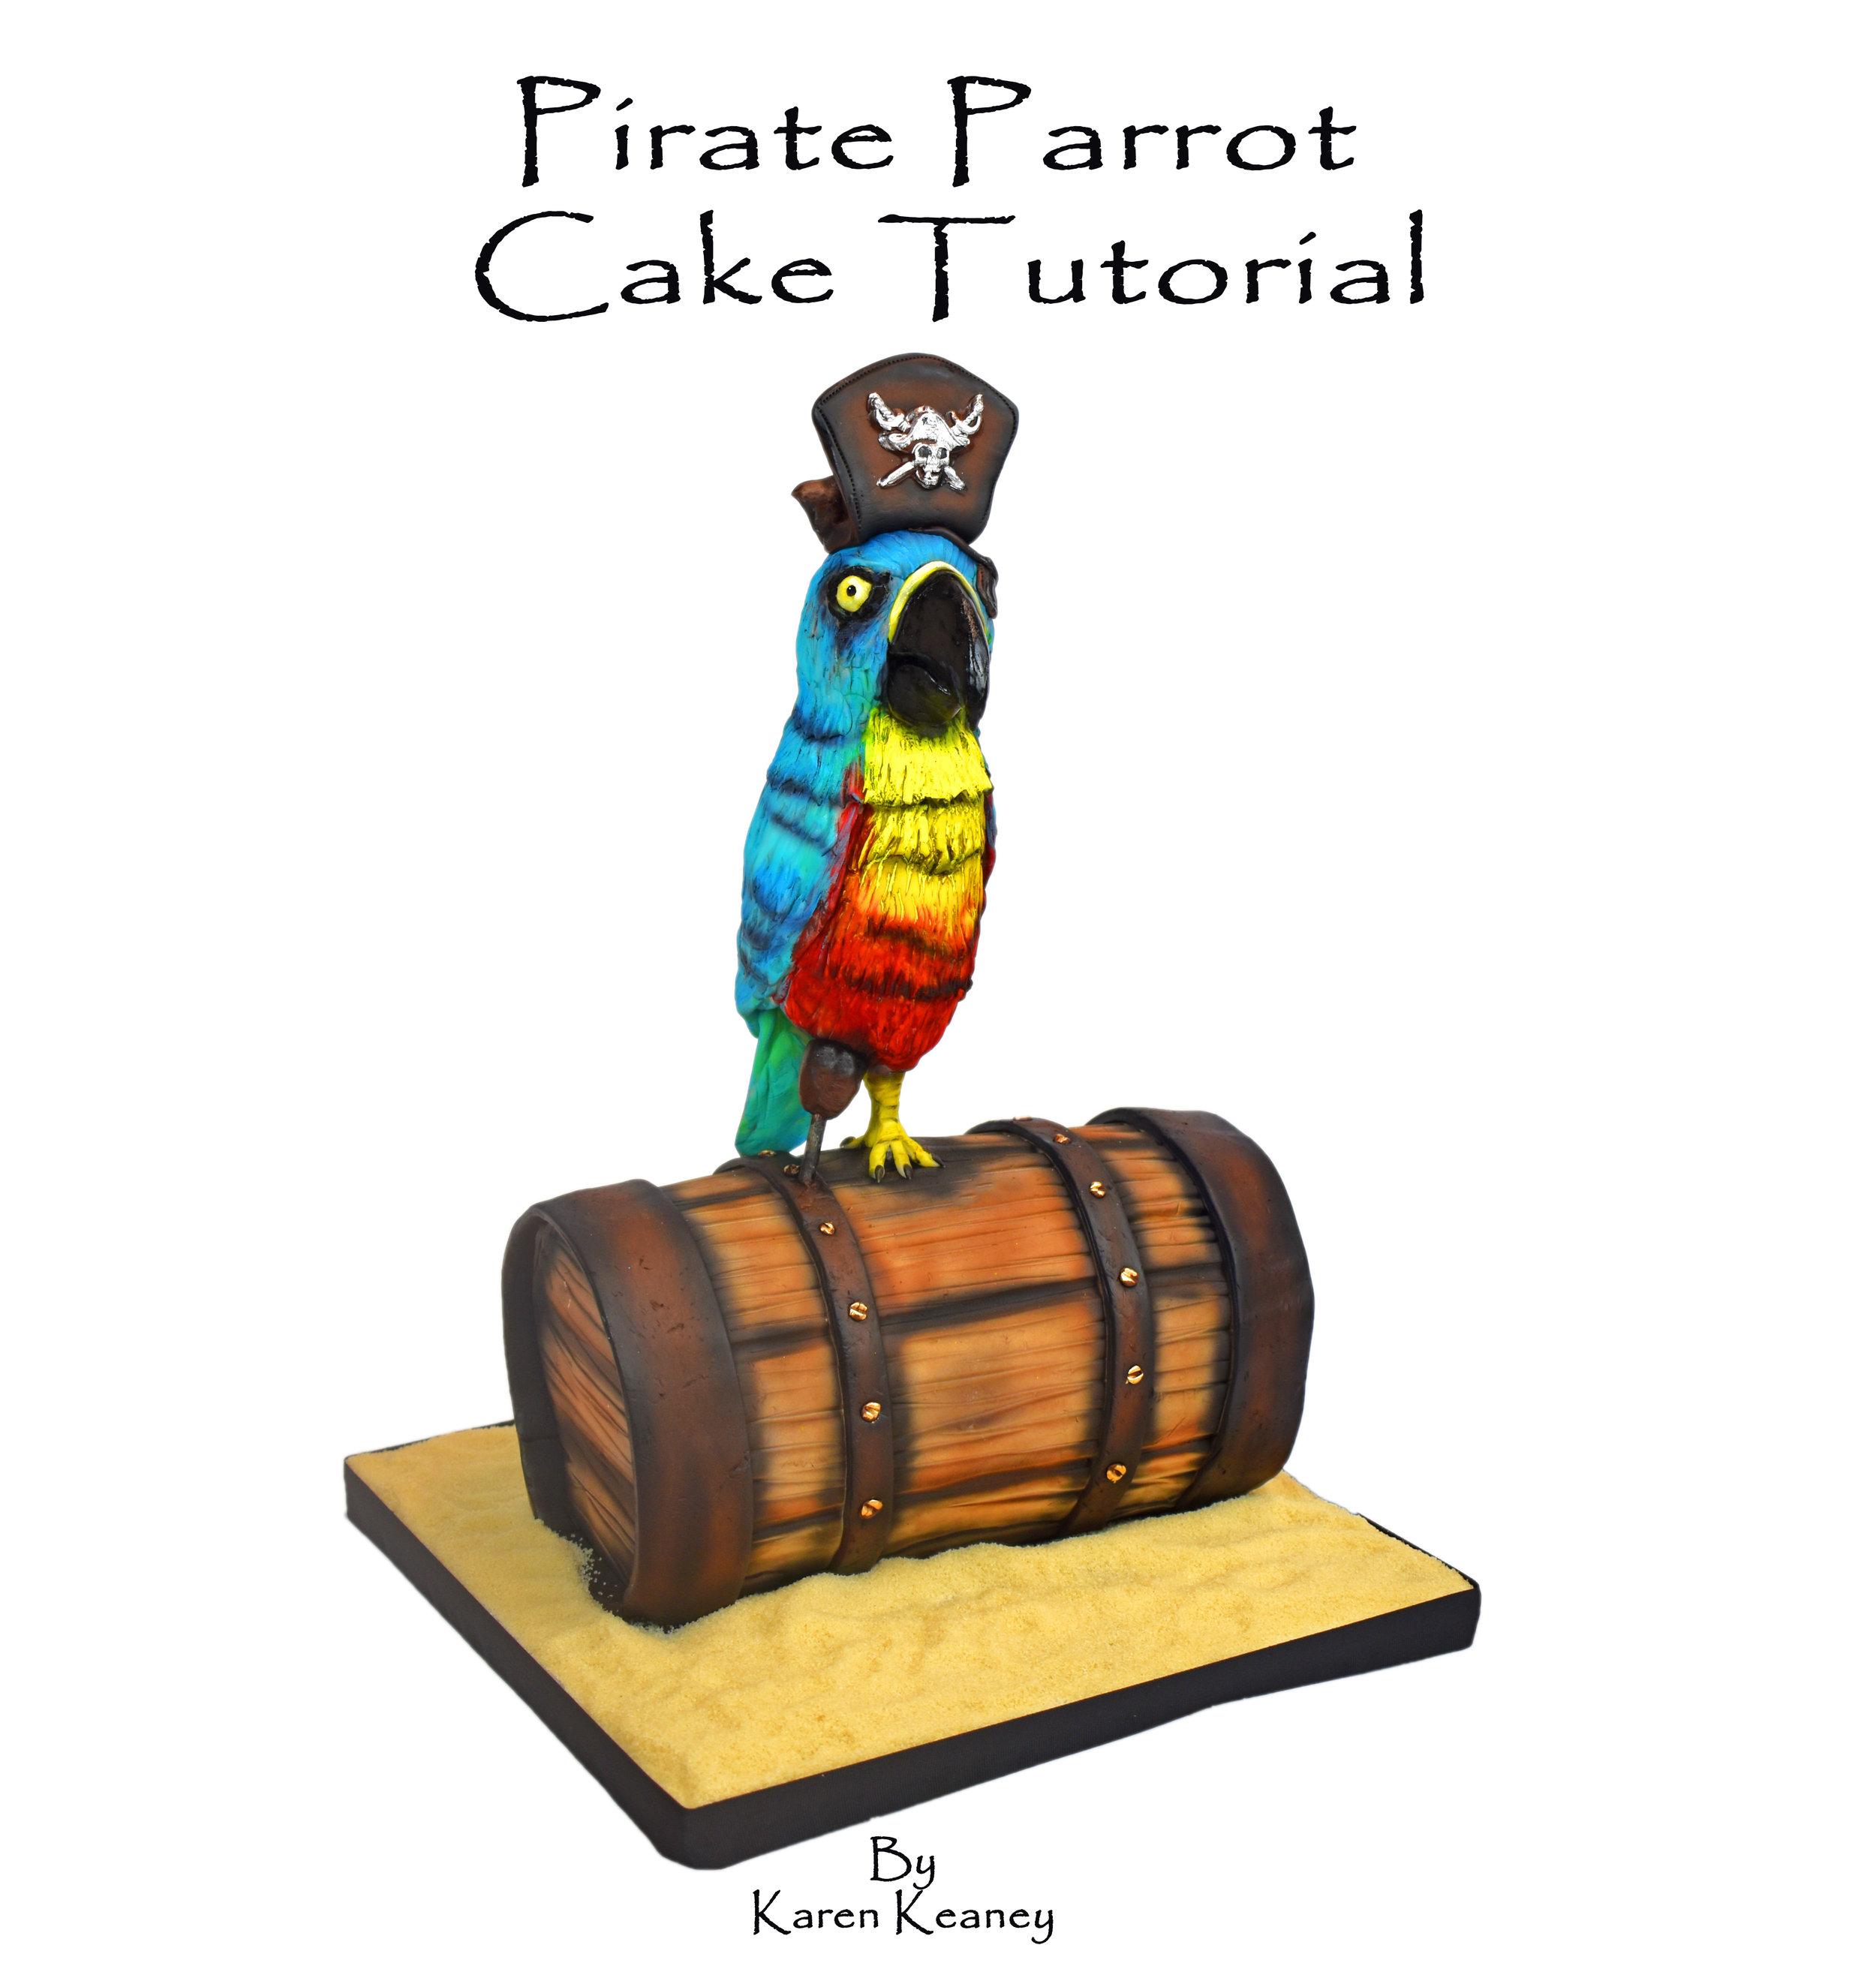 pirate parrot poster.jpg